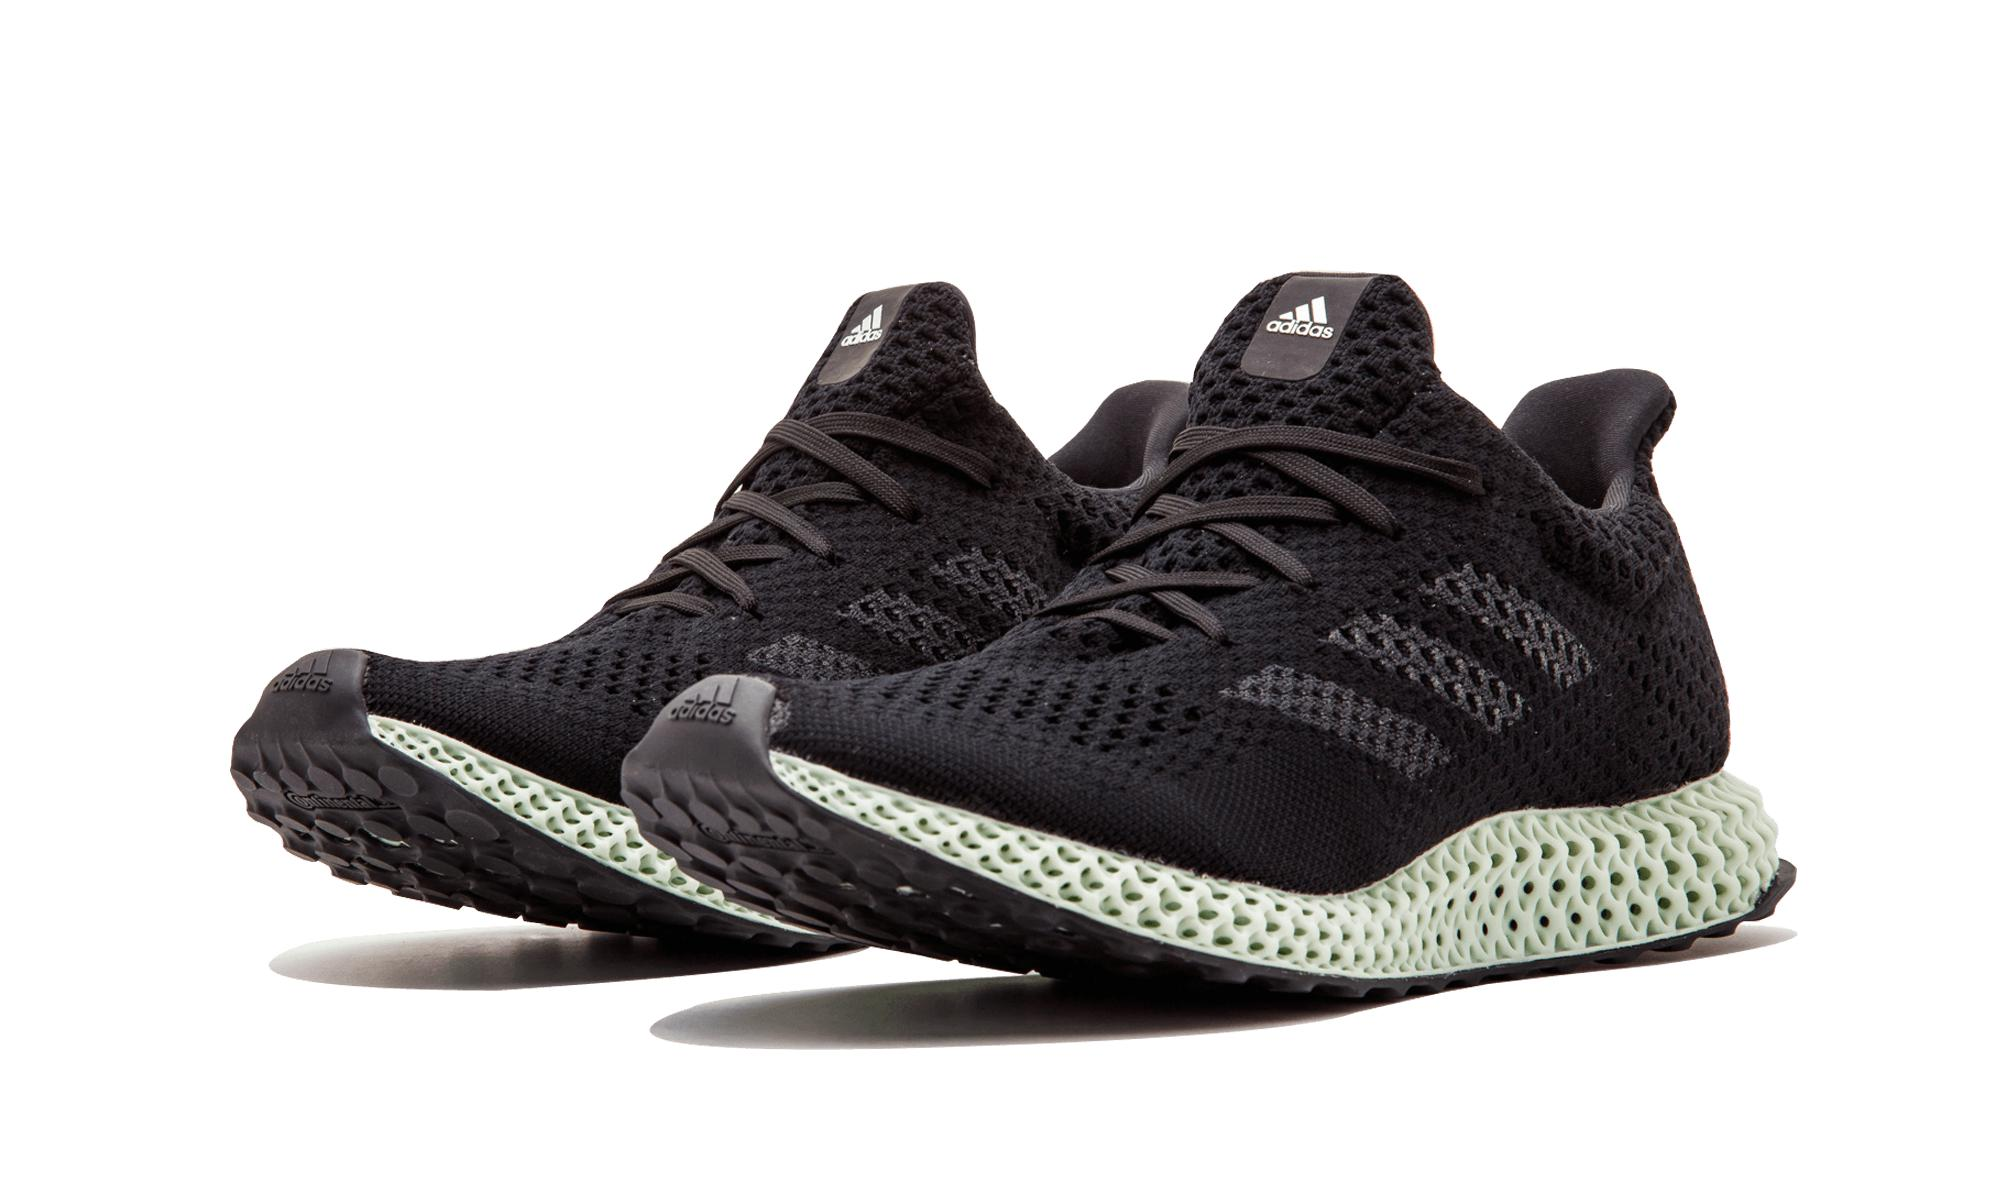 6dbb9c4d40bbc4 Adidas - Black Futurecraft 4d for Men - Lyst. View fullscreen